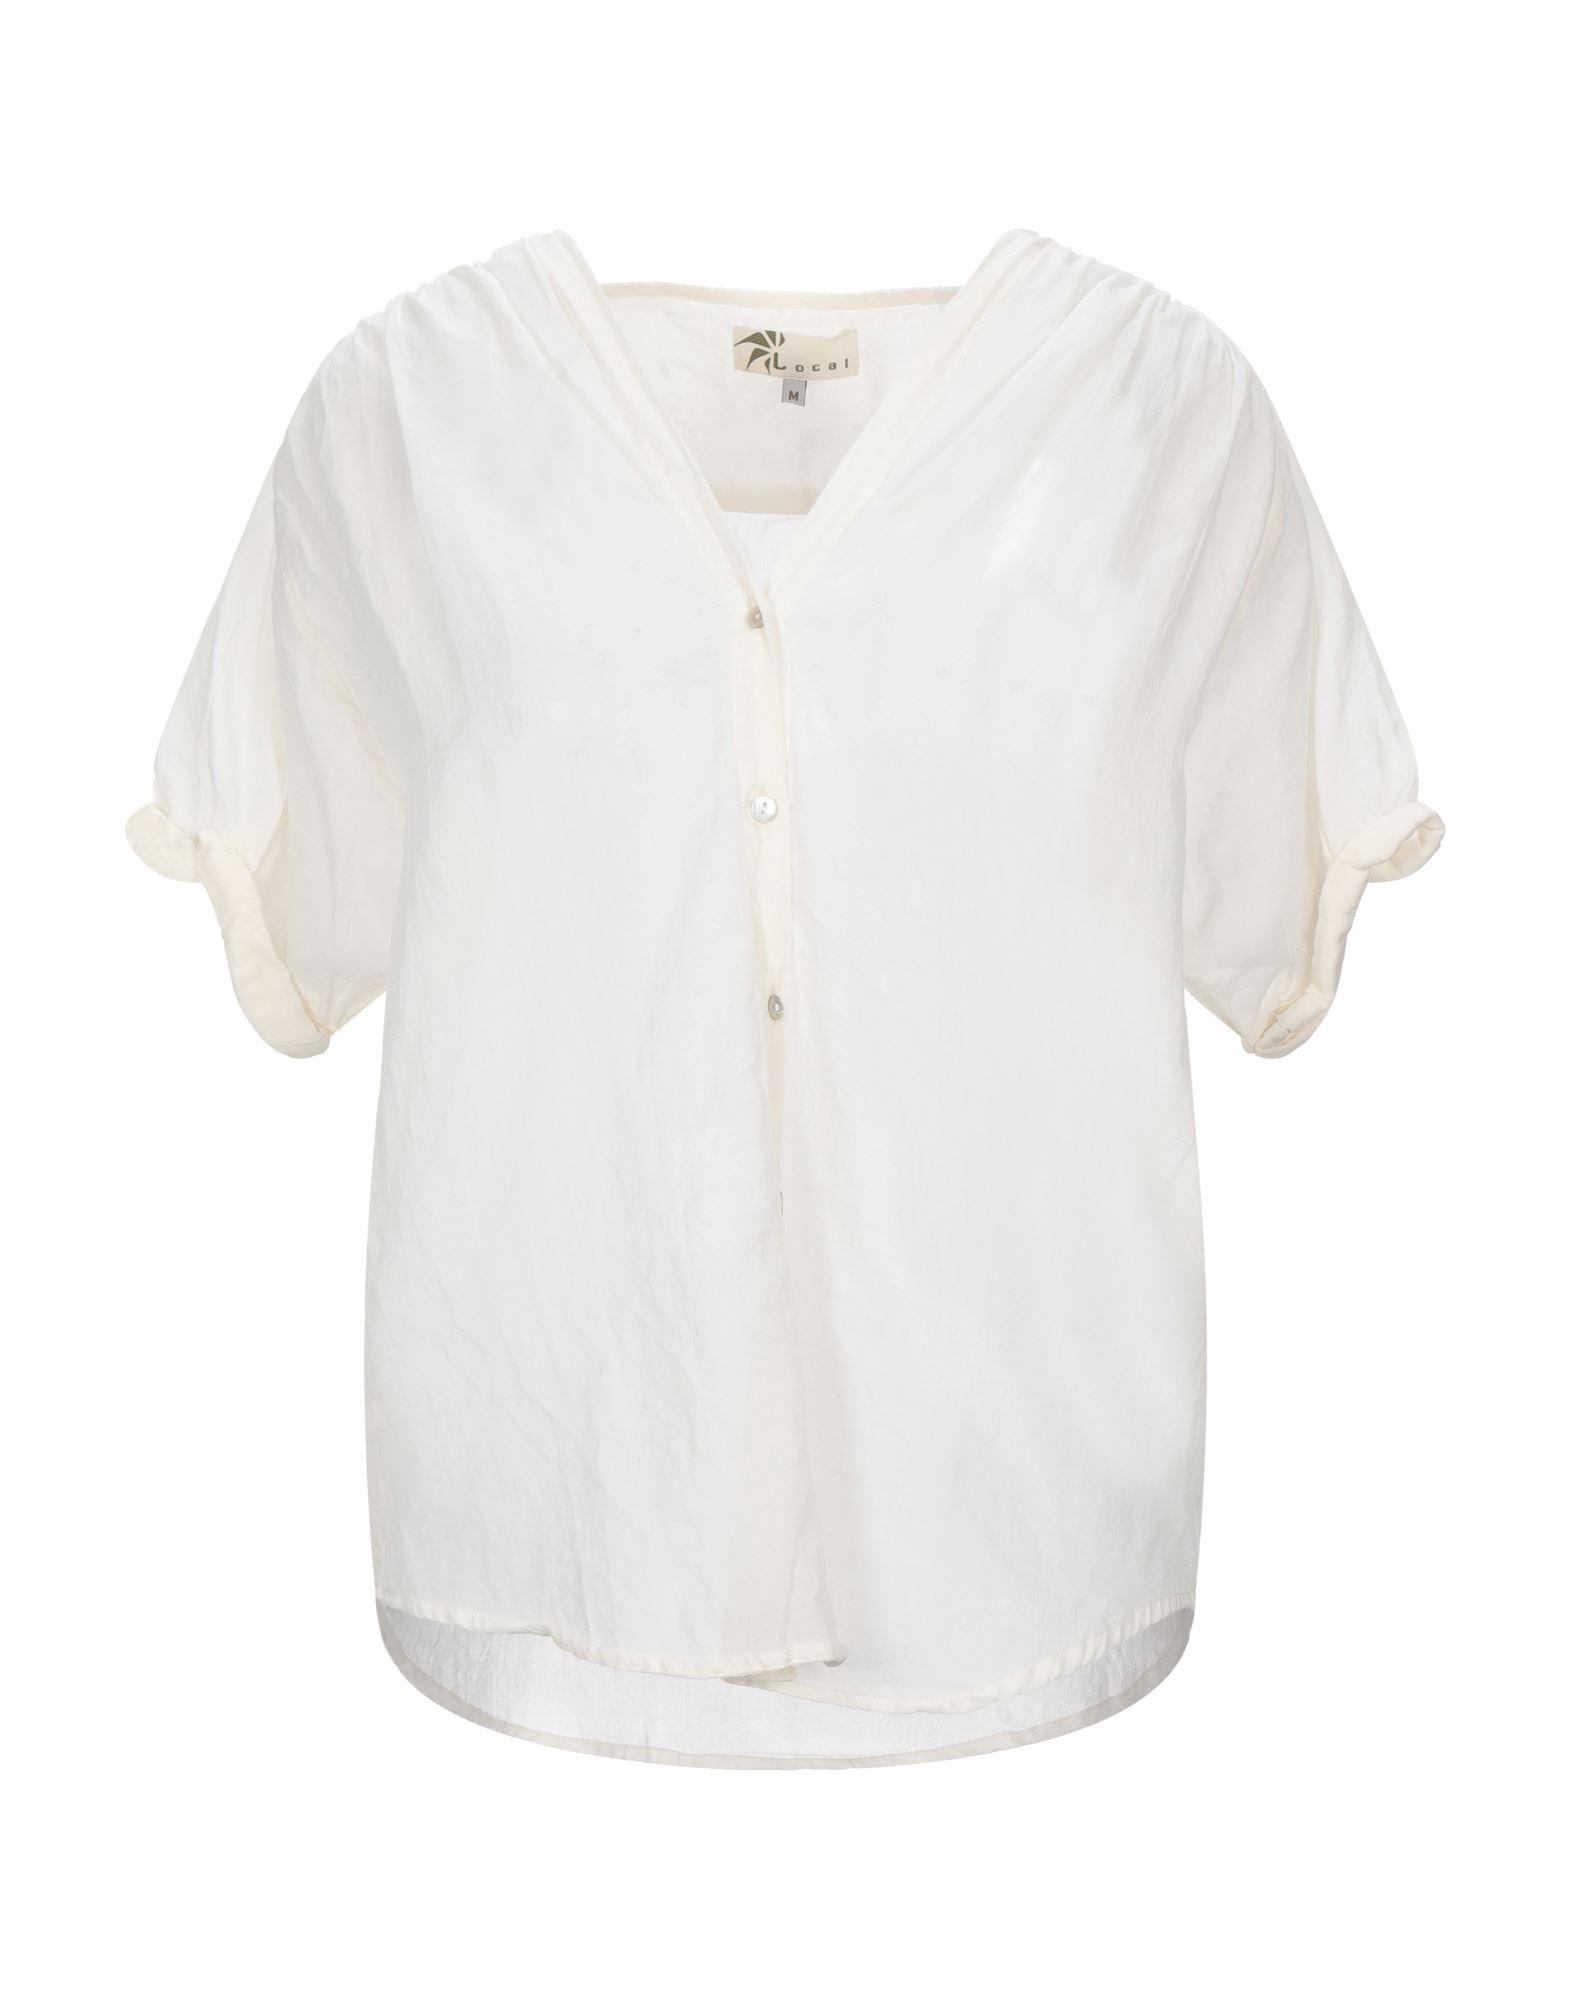 LOCAL APPAREL Pубашка local apparel топ без рукавов